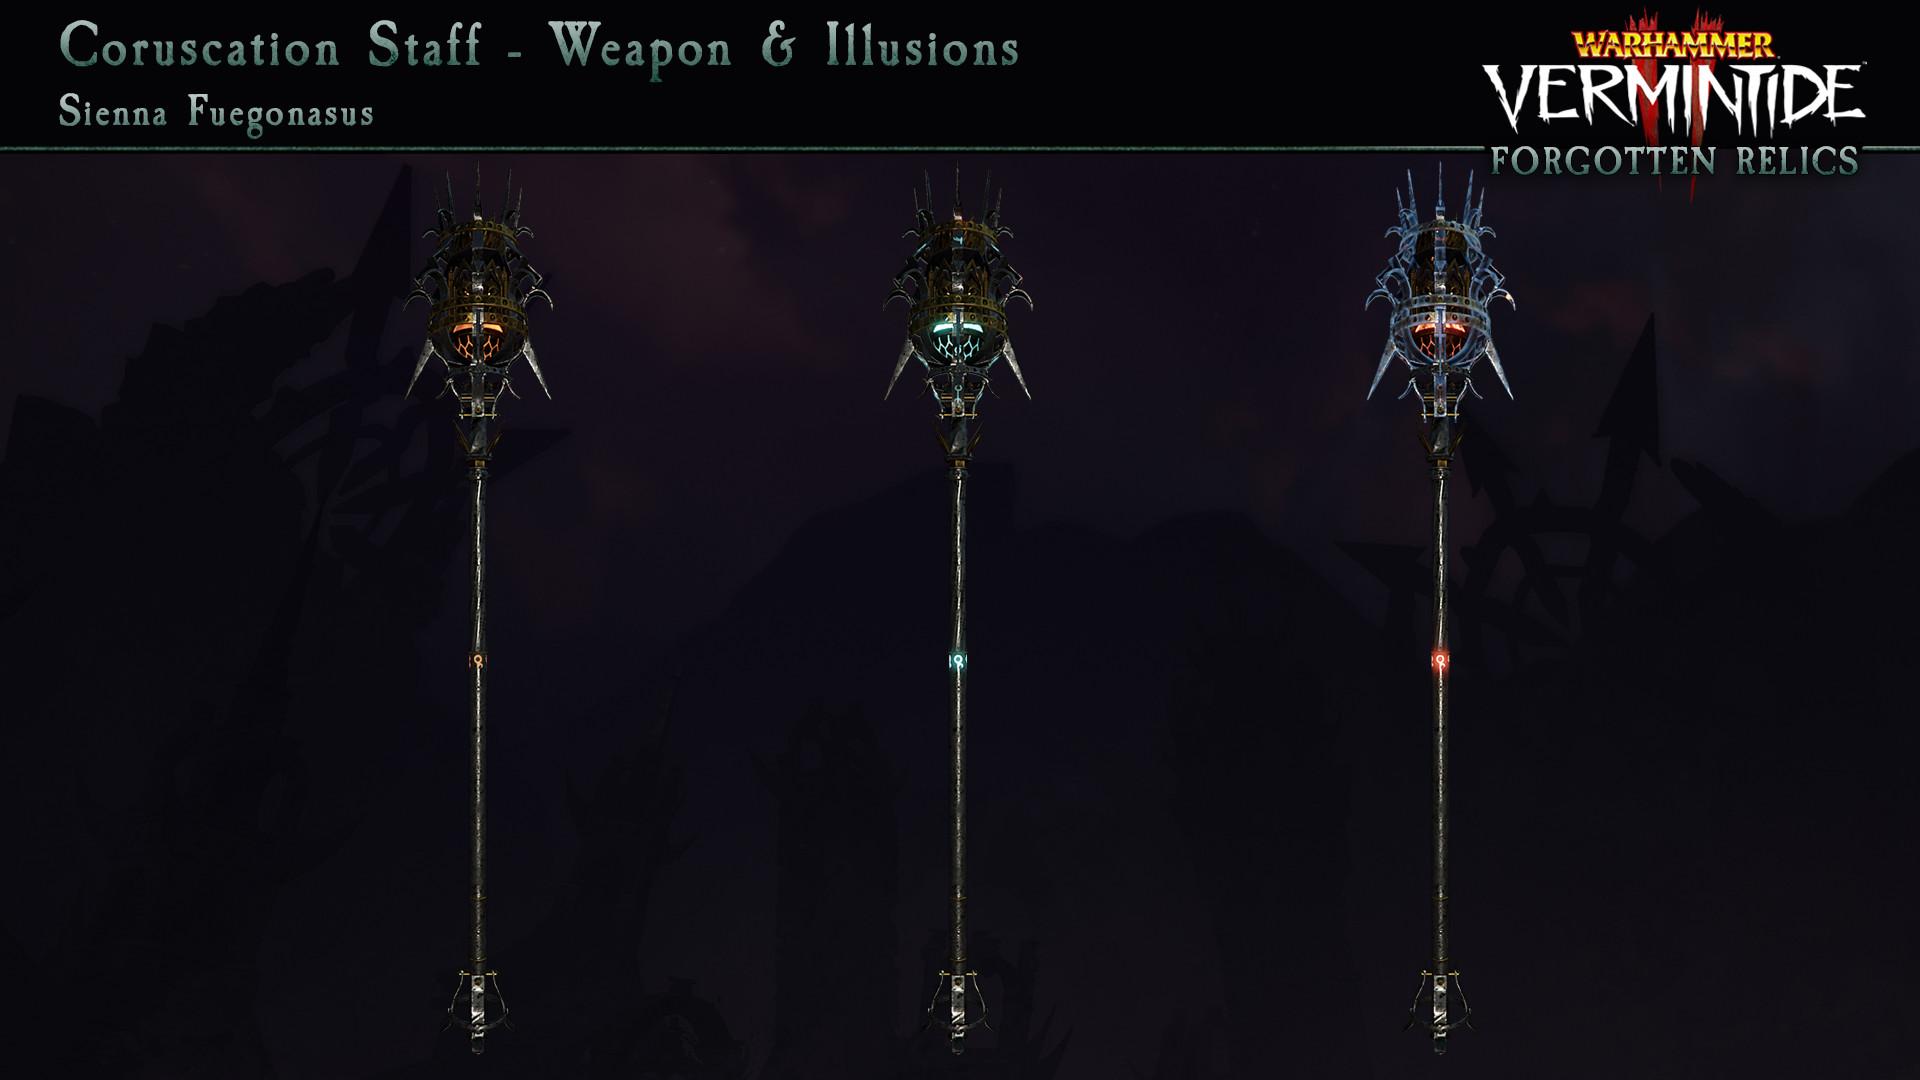 Warhammer: Vermintide 2 - Forgotten Relics Pack Fiyat Karşılaştırma